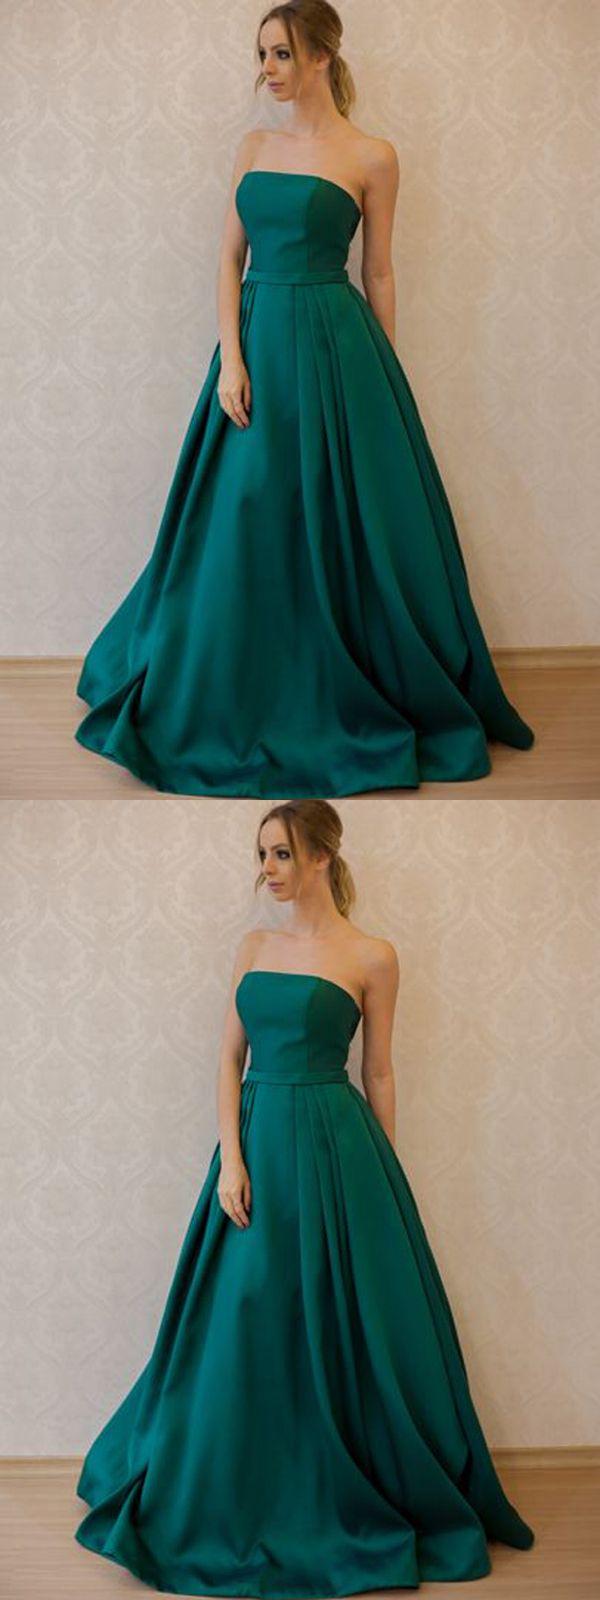 long prom dress aline cheap simple modest strapless prom dress